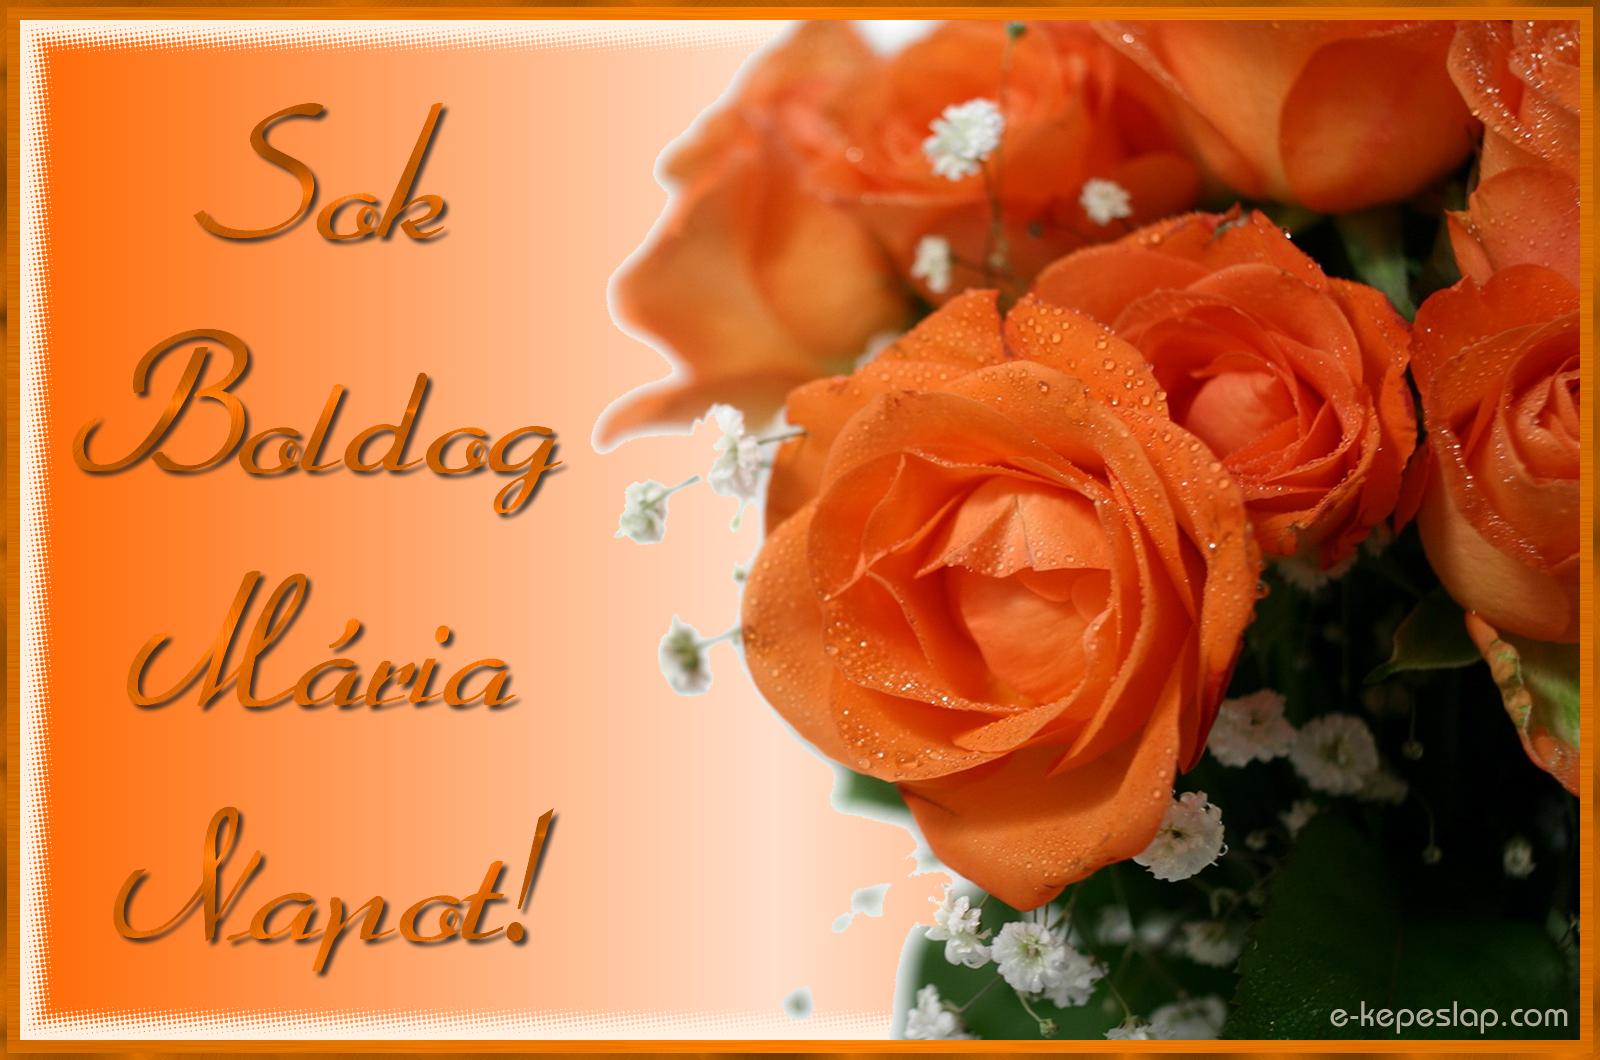 boldog mária napot Boldog Mária napot!   Képeslapküldés   e kepeslap.com boldog mária napot